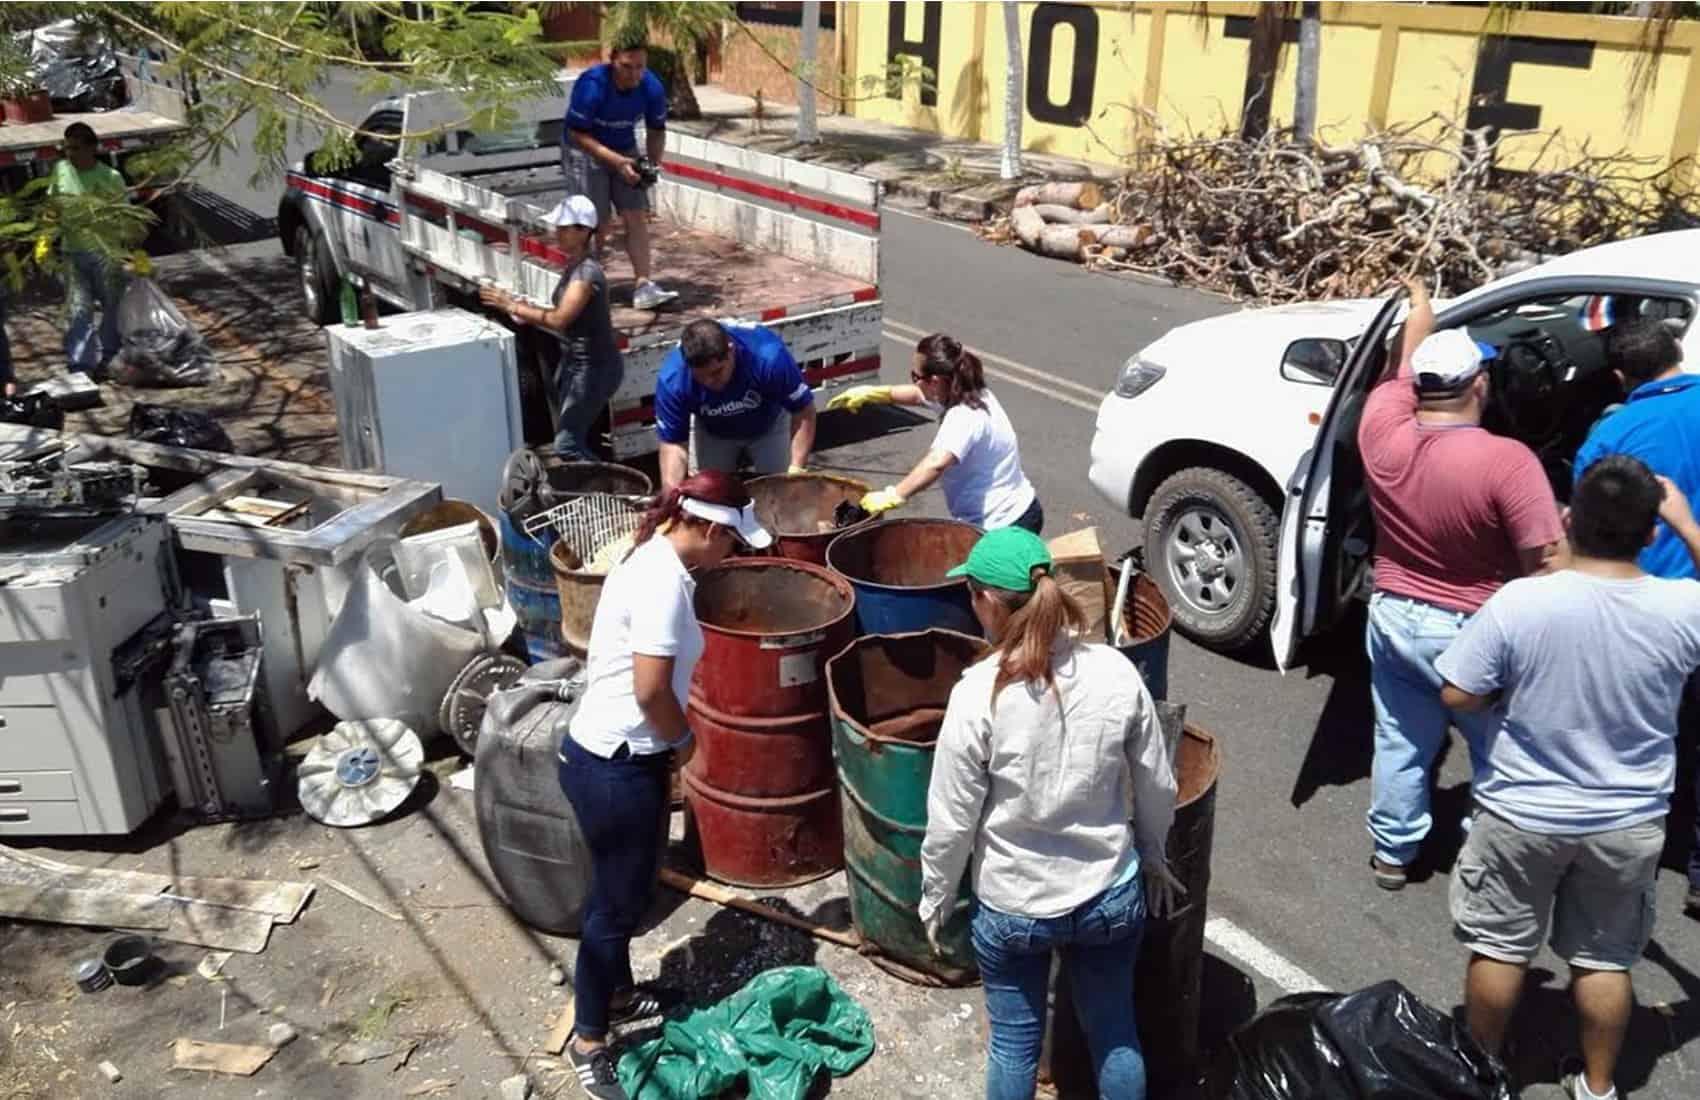 Search of Zika breeding sites in Puntarenas, Feb. 2016